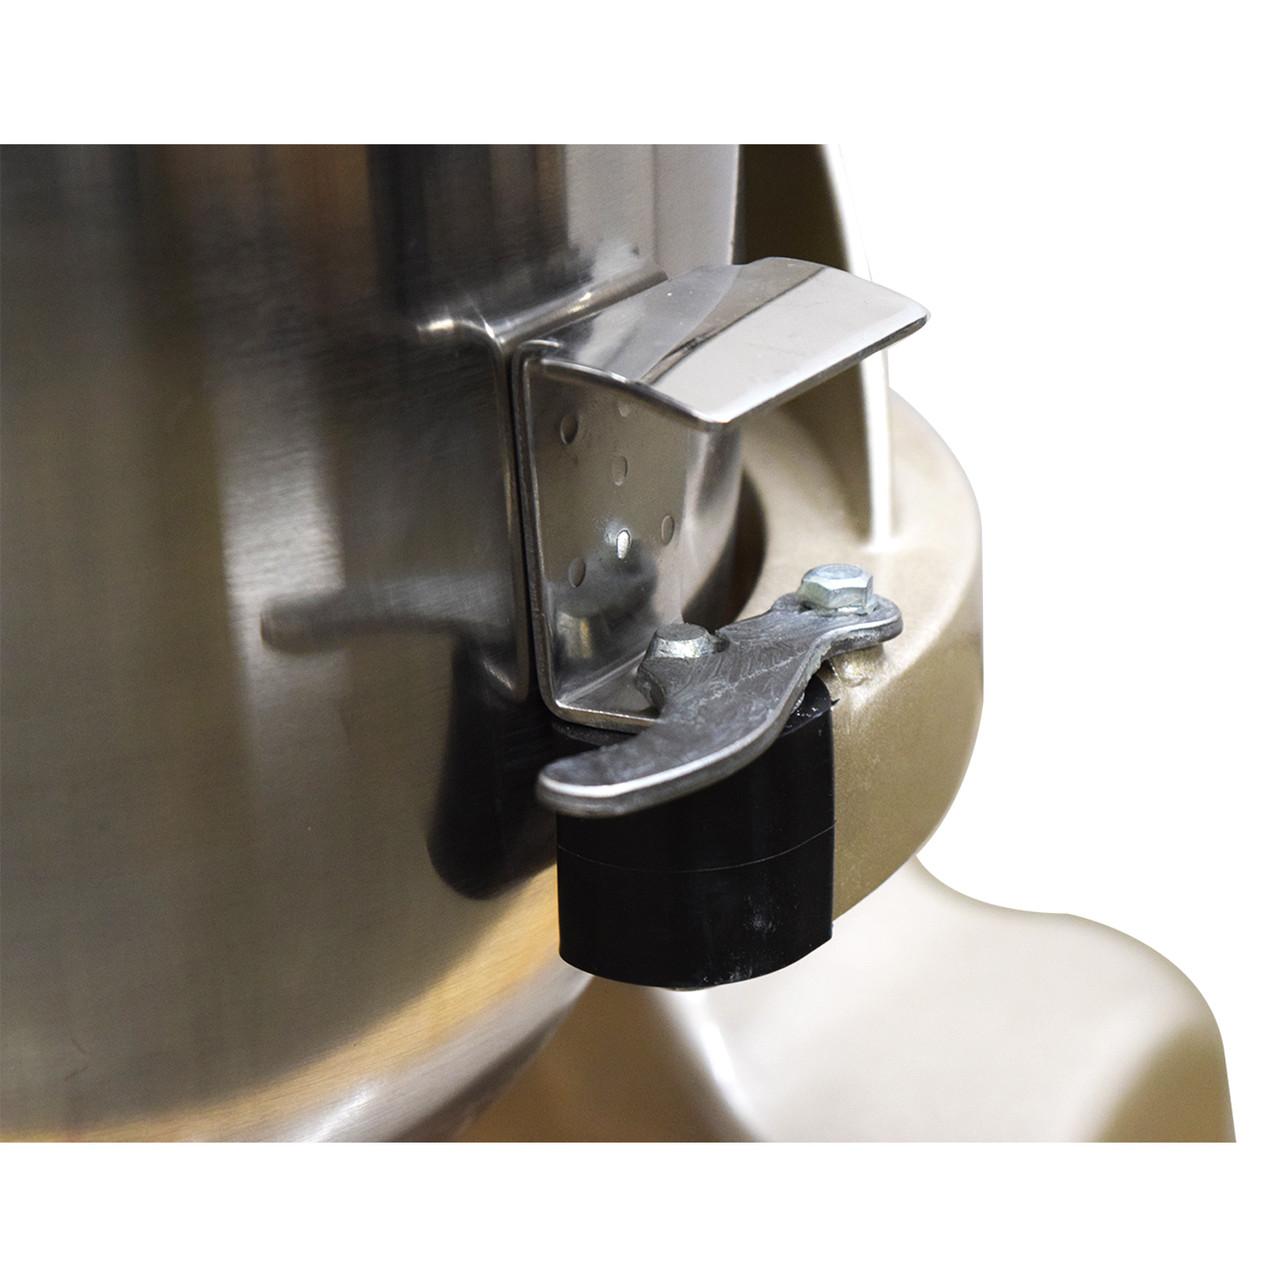 AE-20GA 20 Quart Commercial Planetary Mixer Bowl Right Arm Detail And Bowl Lock